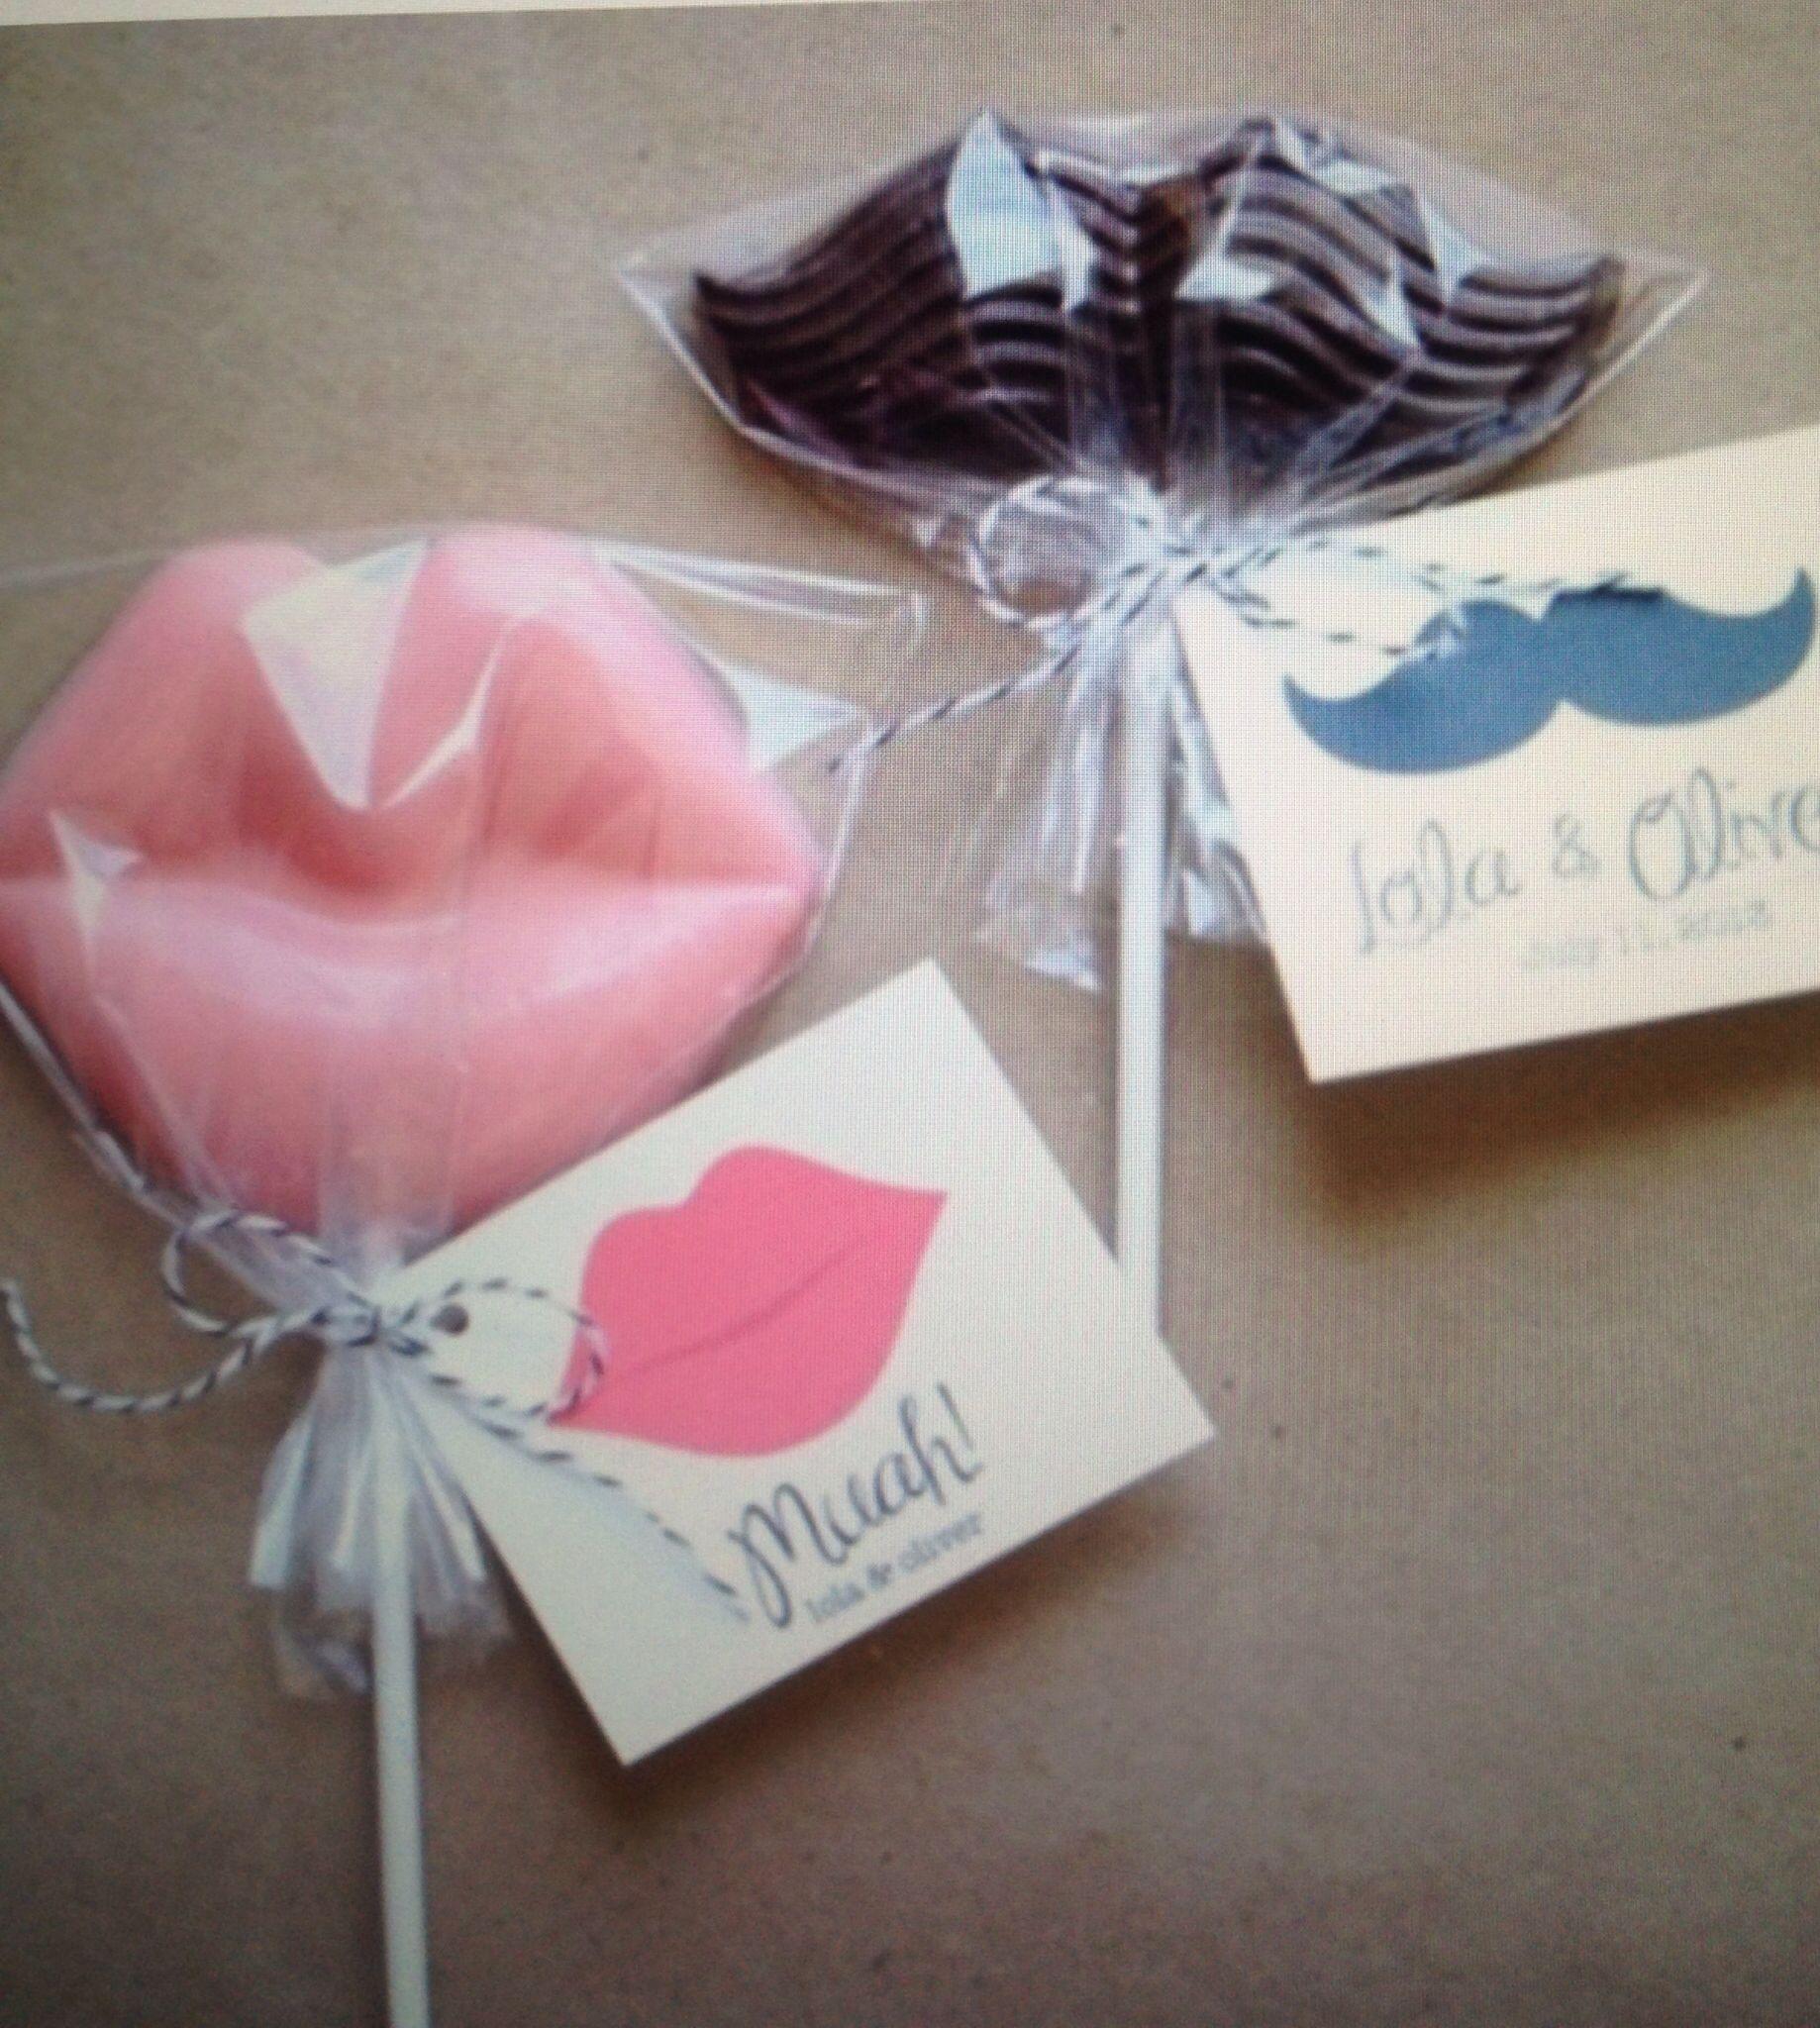 Favors | Wedding | Pinterest | Favors, Wedding and Bodas